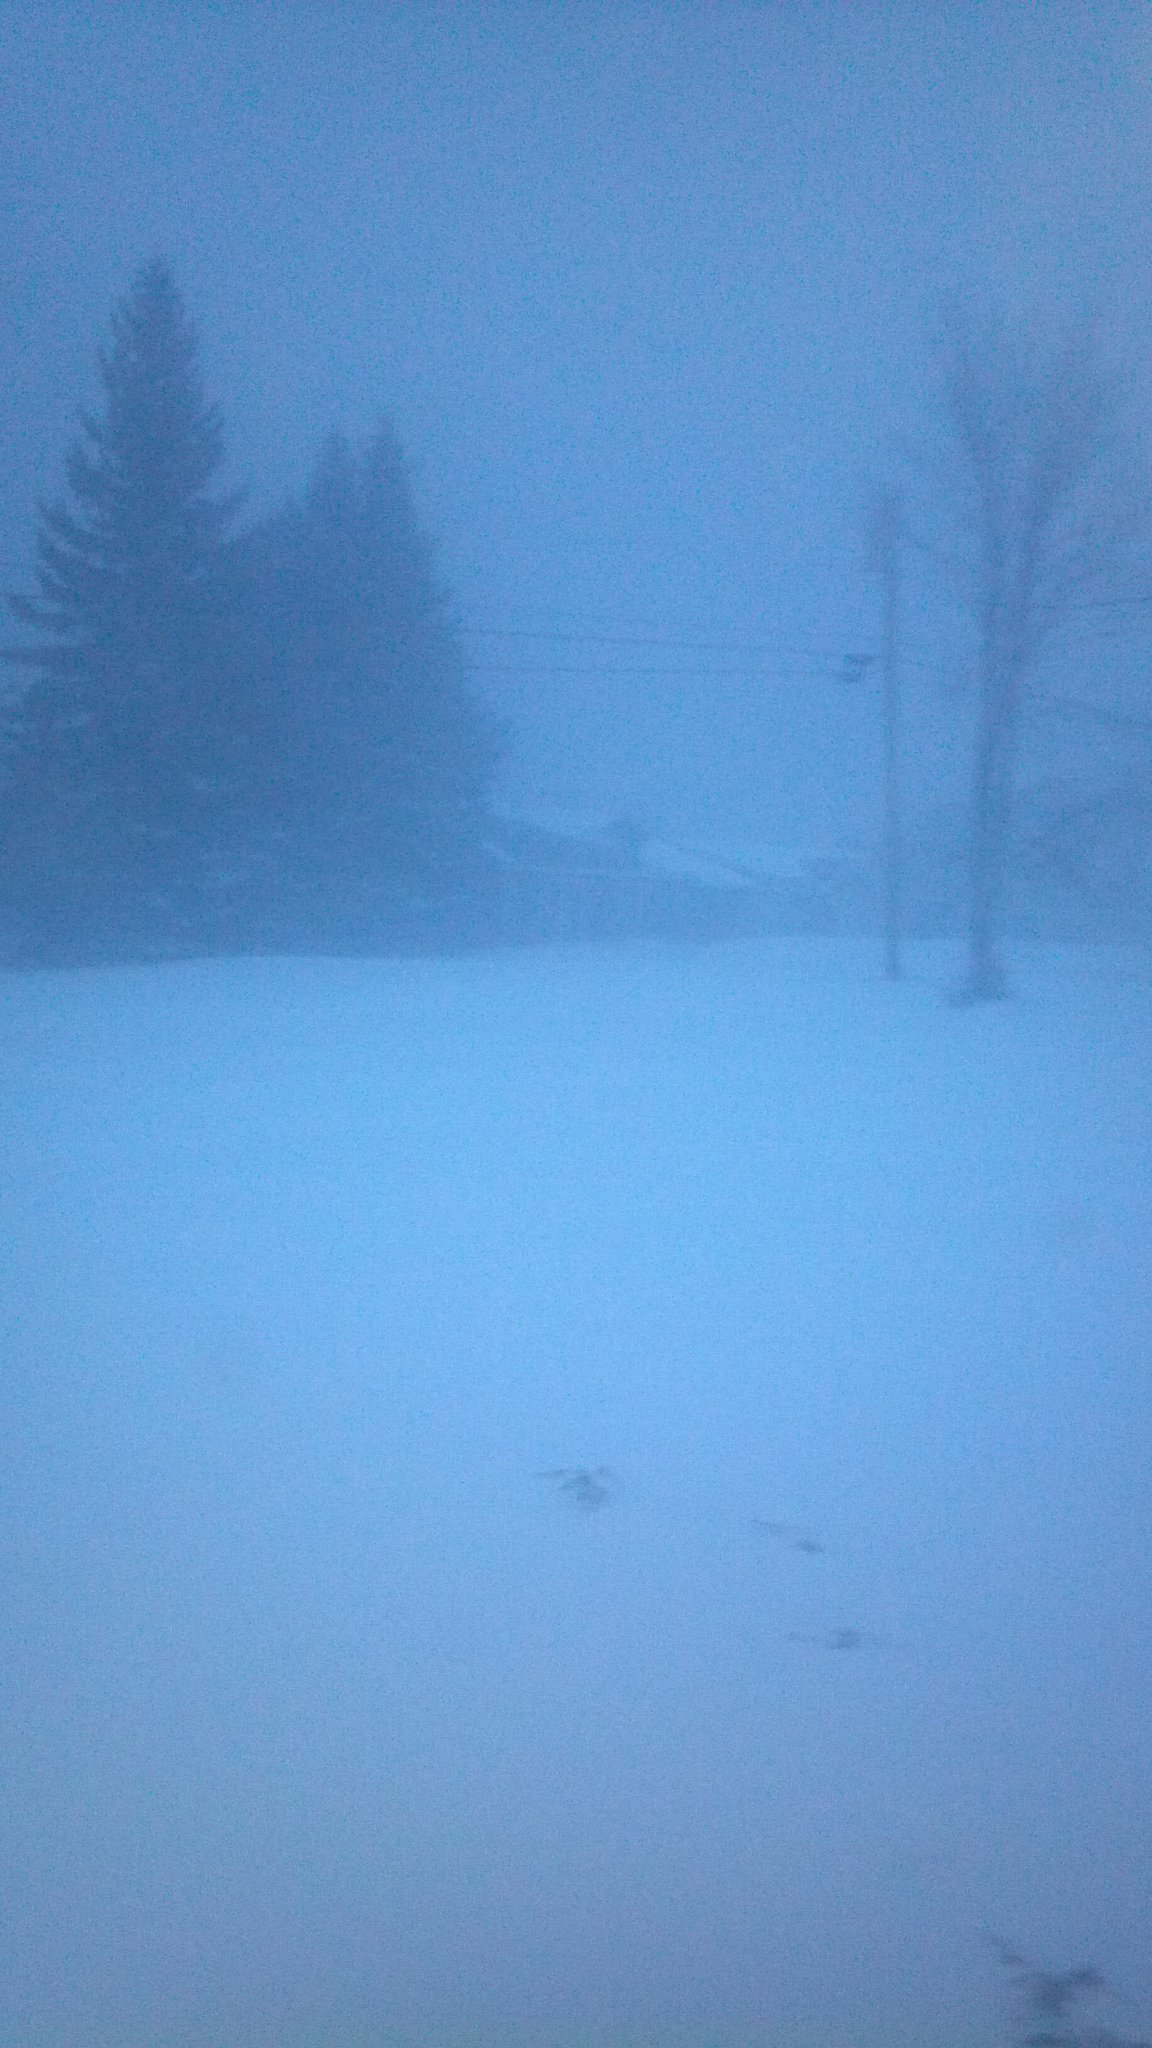 Snows begin in Northeast U.S. as historic Nor\'easter strengthens ...